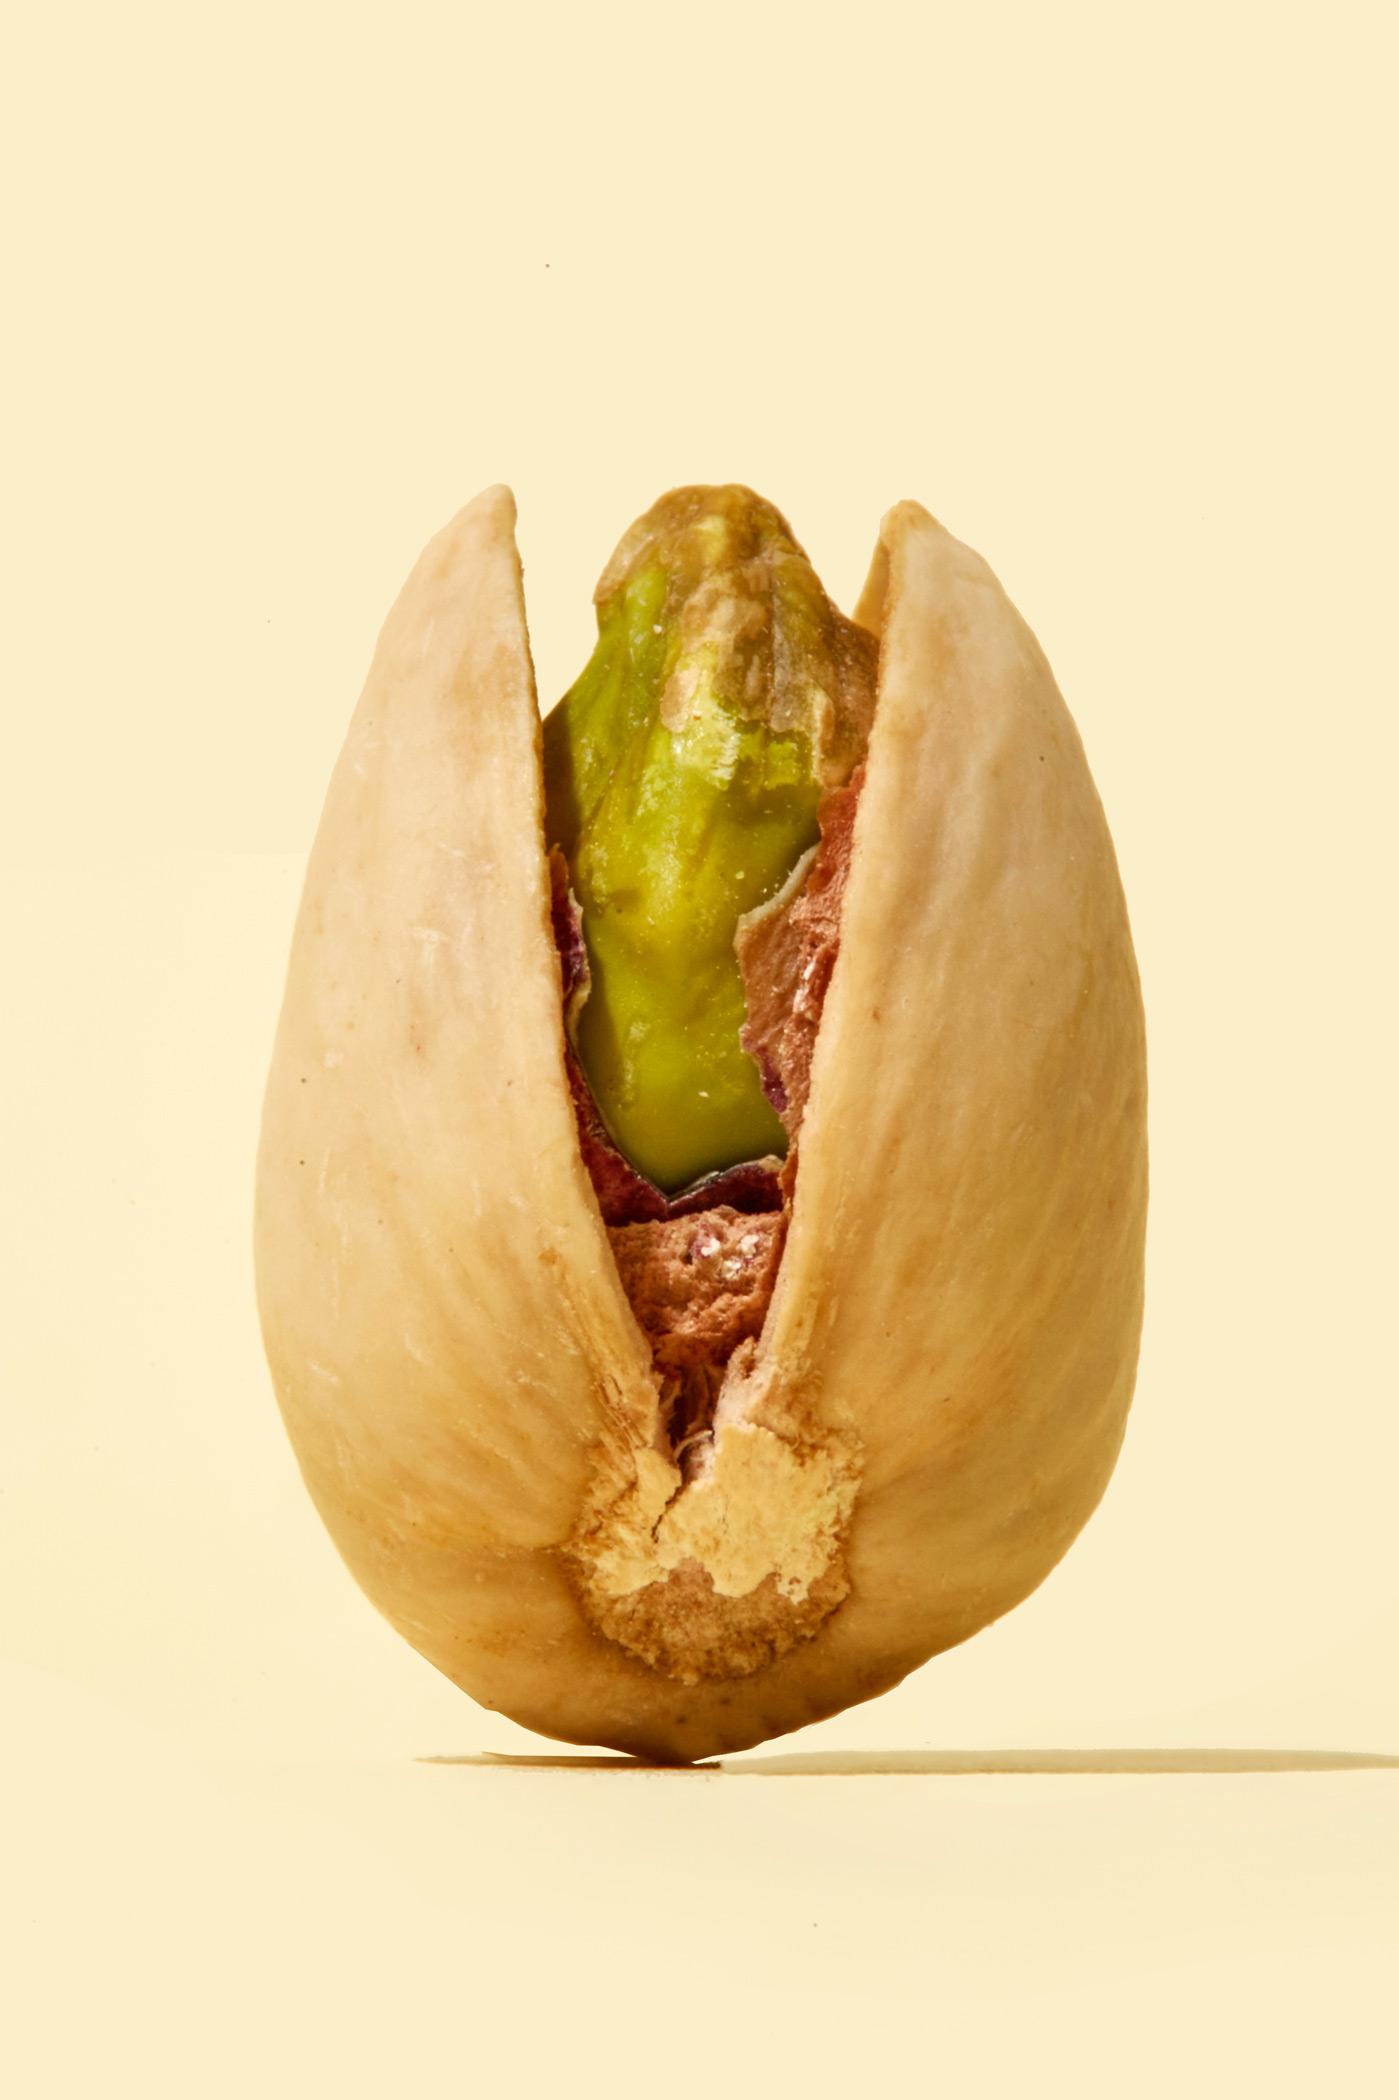 healthiest foods, health food, diet, nutrition, time.com stock, pistachio, nut